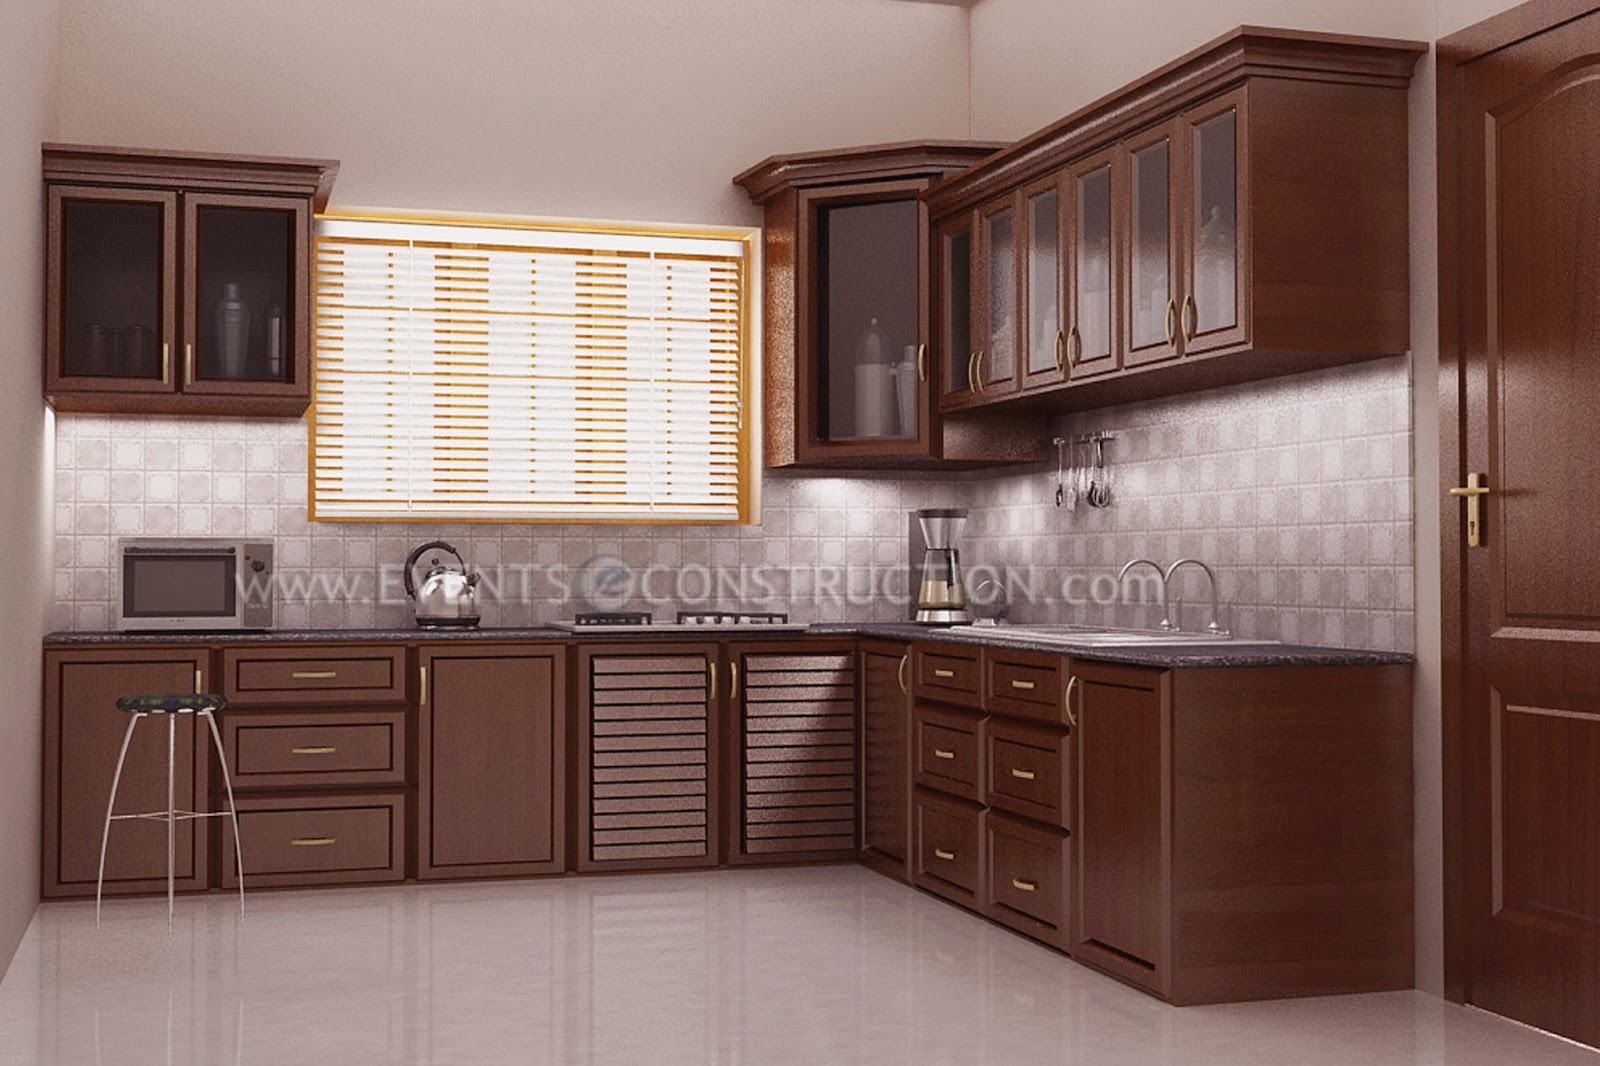 Evens Construction Pvt Ltd: Kitchen Design With Wooden ... on Design Model Kitchen  id=74387